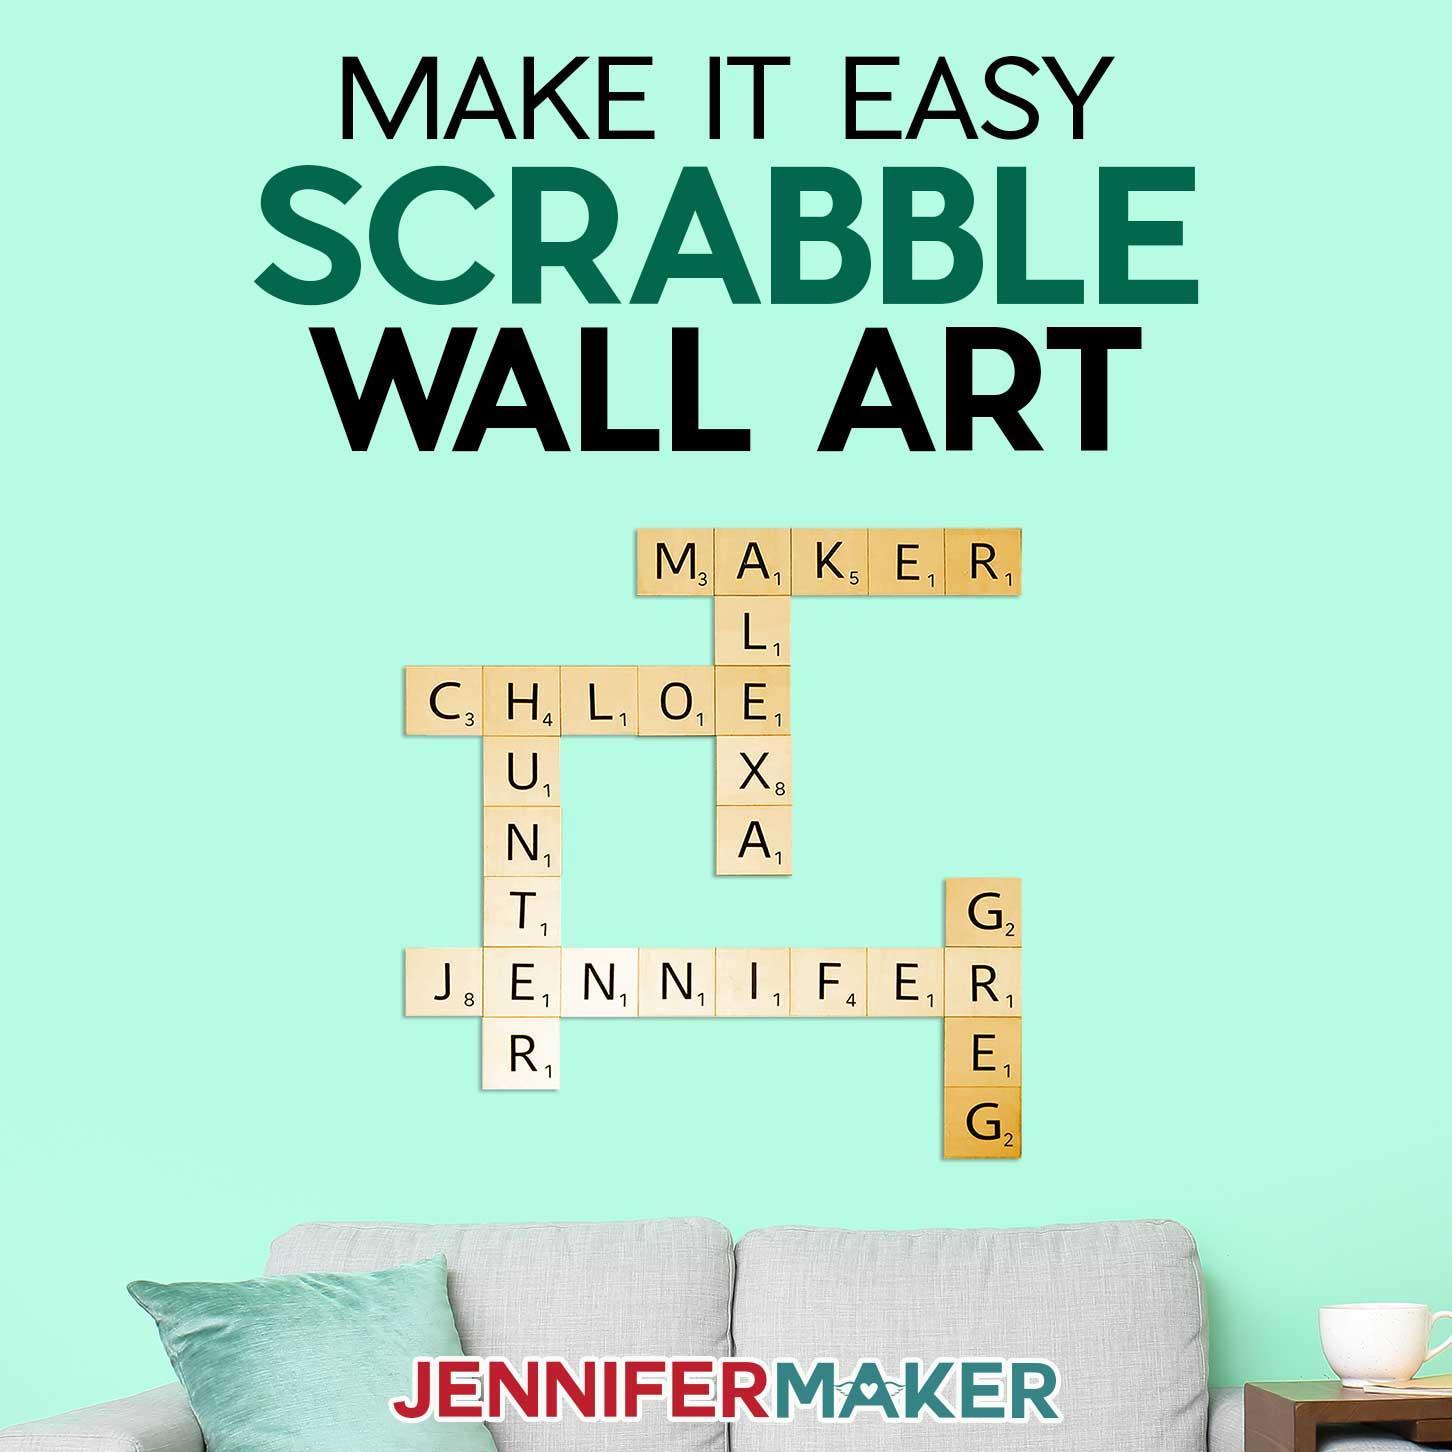 jennifer maker